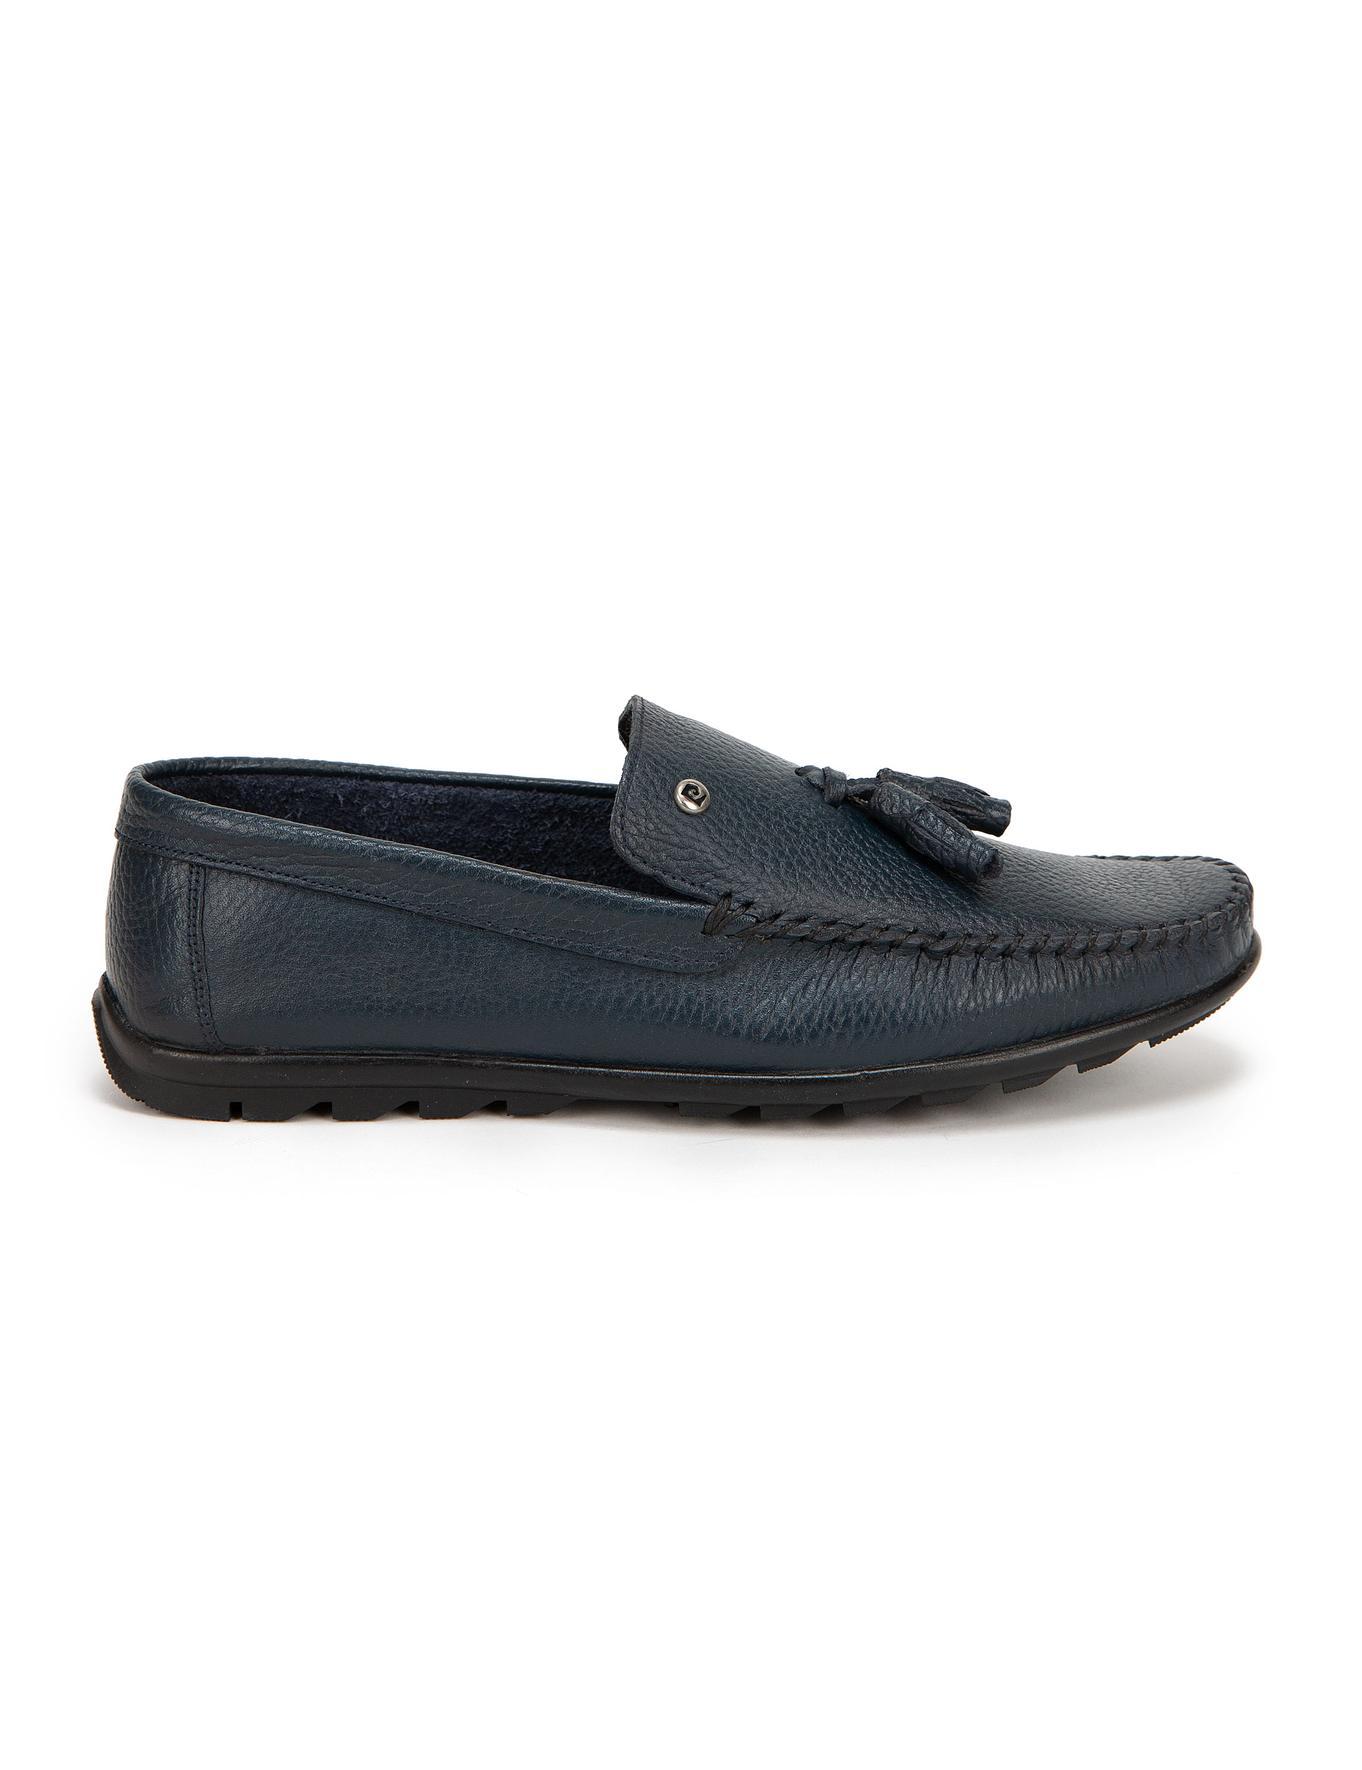 Lacivert Loafer Ayakkabı